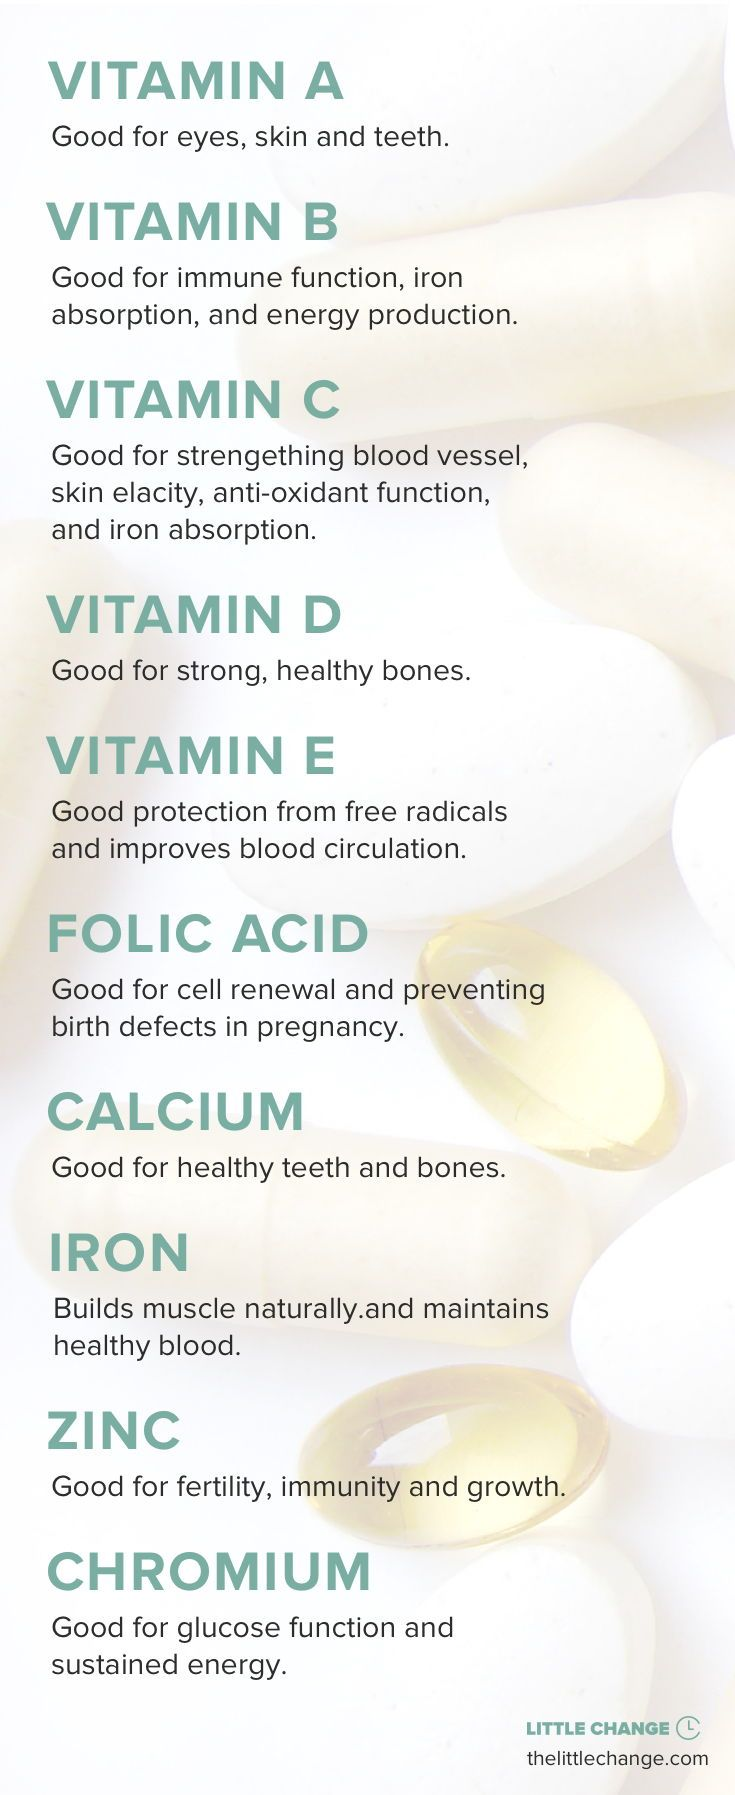 The Benefits of Vitamins #vitamins #supplements #health #healthy #healthbenefits #vitamins